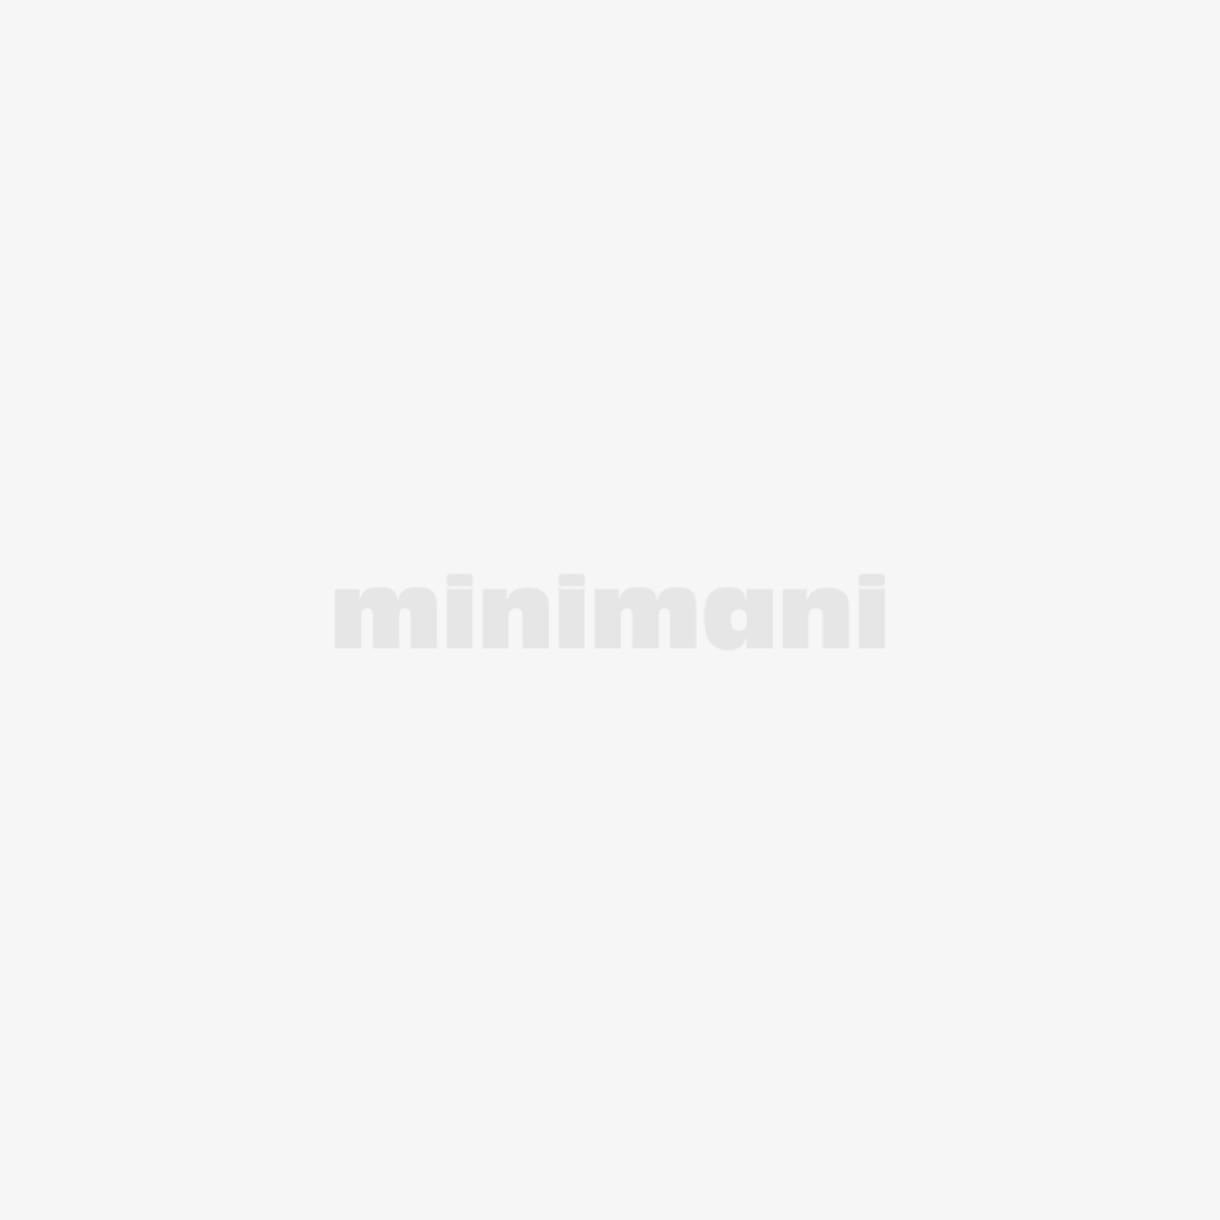 M-FILTER RAITISILMASUODATIN MAC 8008 AUDI, SEAT, SKODA, VW